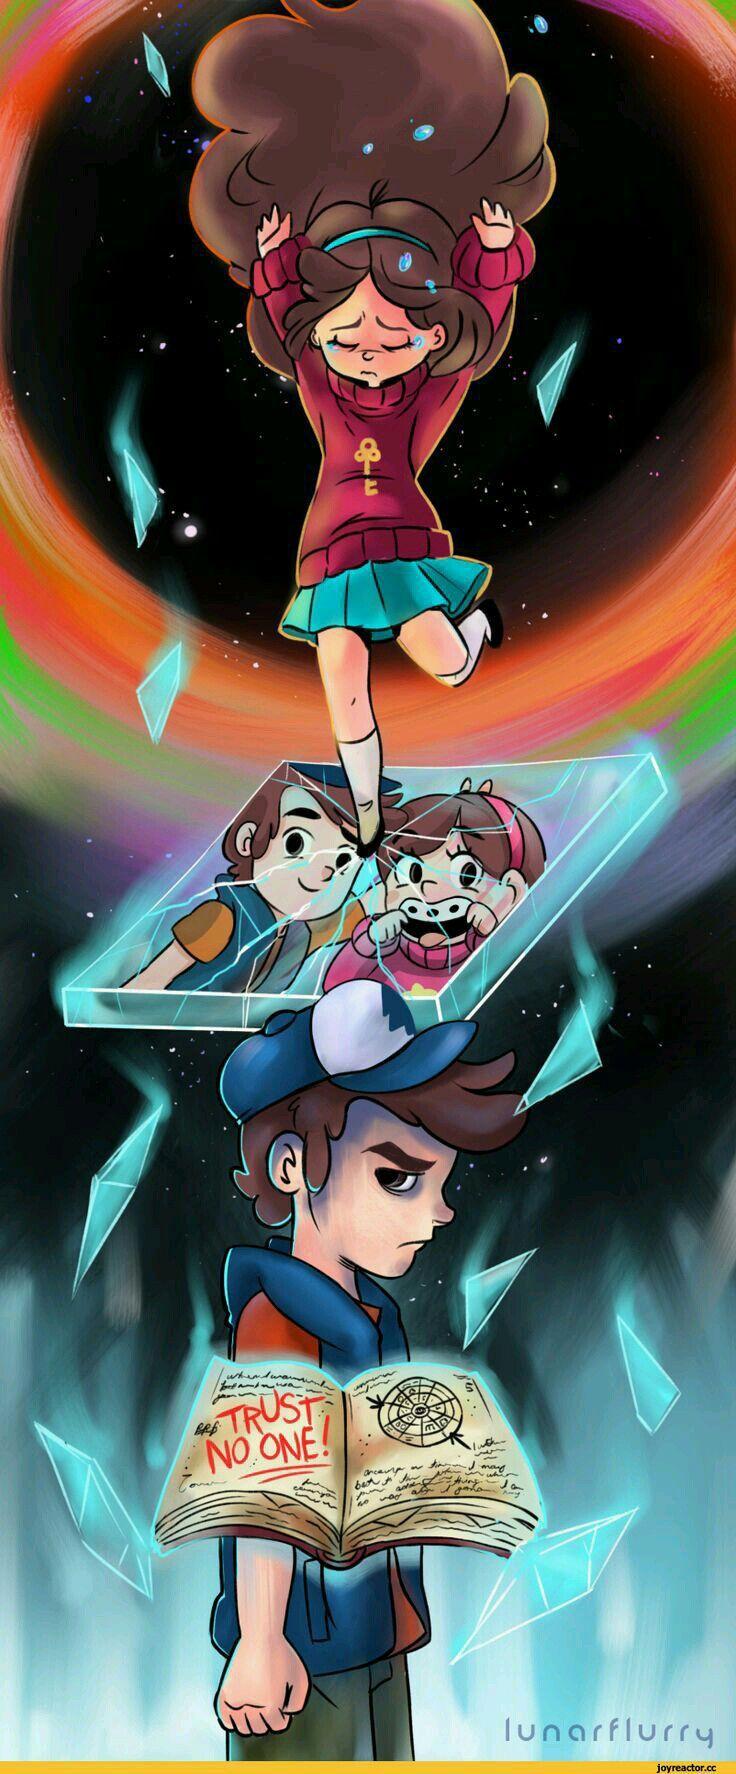 Imágenes De Gravity Falls [En Español] - :c - Wattpad